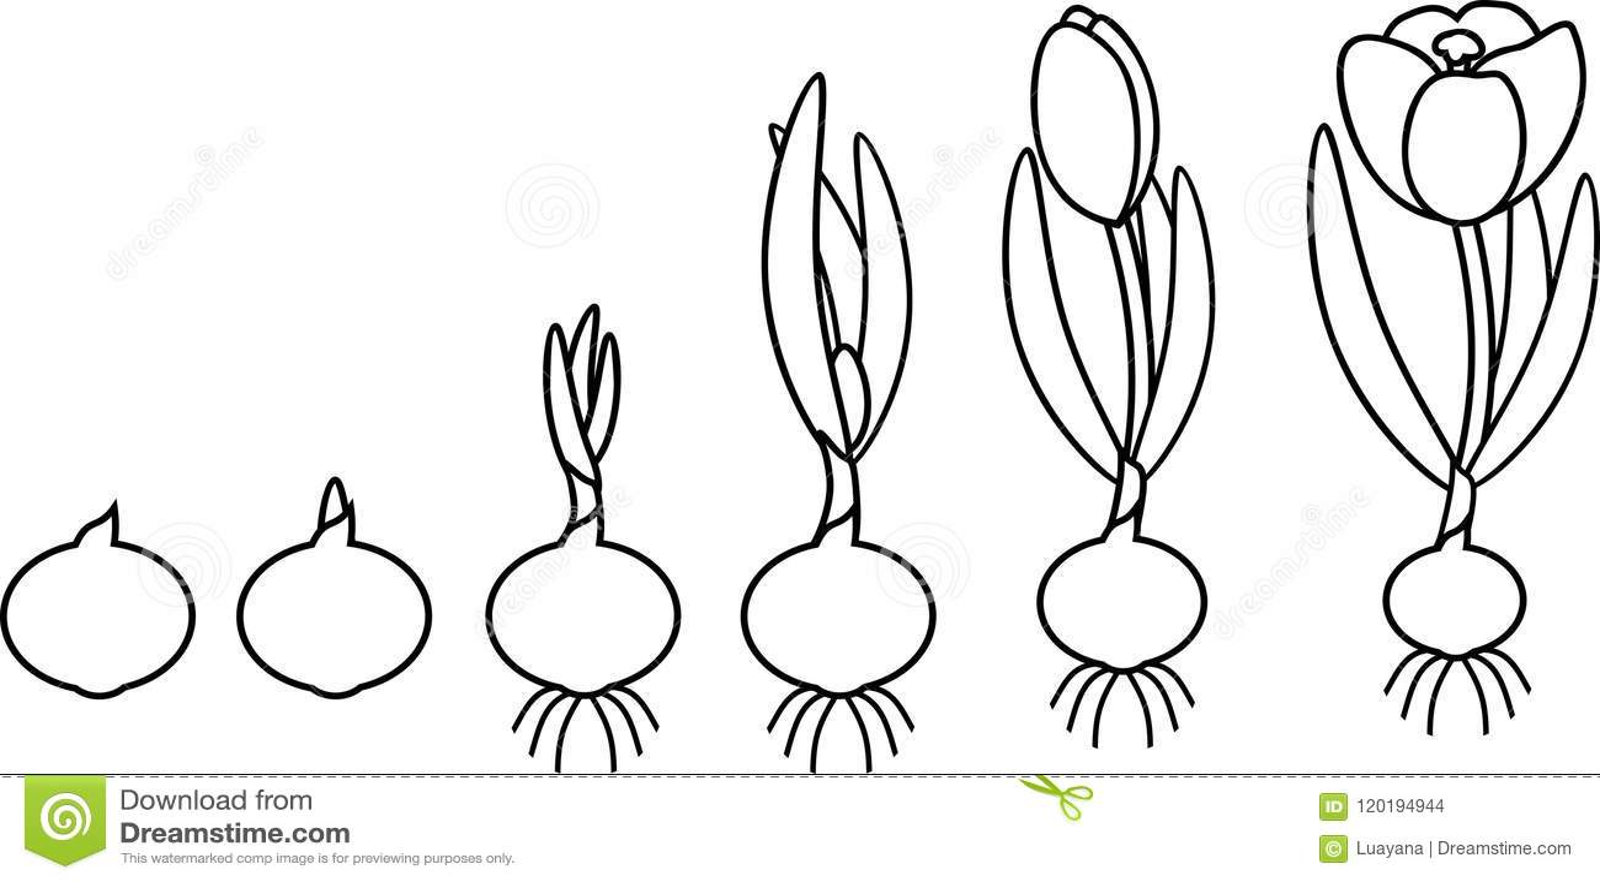 Crocus life cycle. stock vector. Illustration of grow